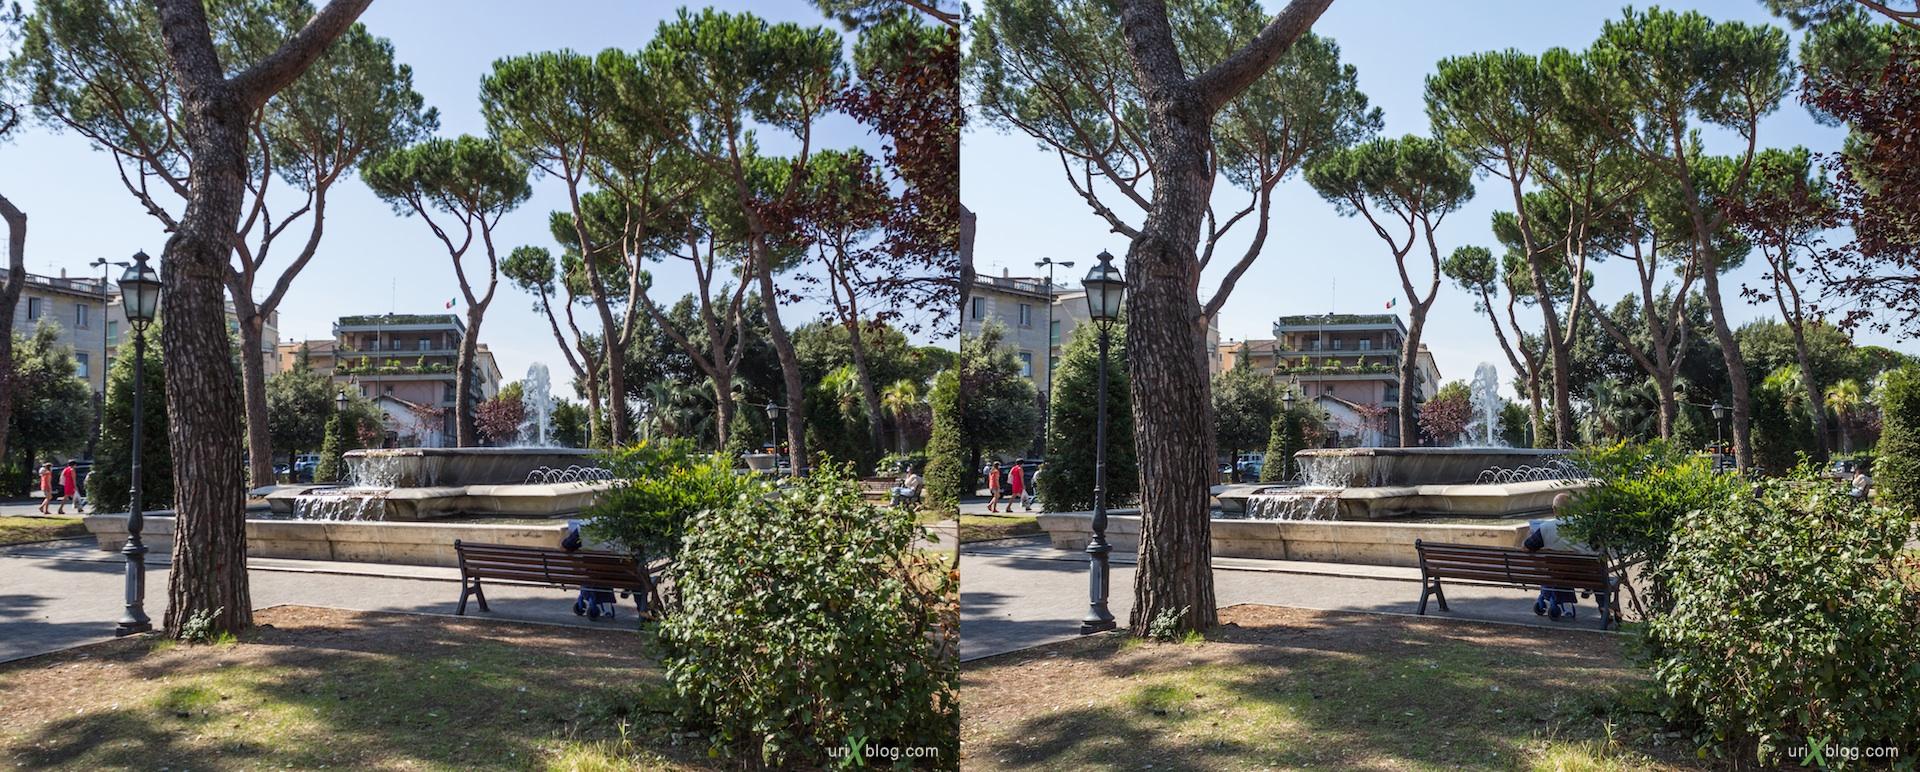 2012, фонтан, парк, Тиволи, Италия, fountain, park, Tivoli, Italy, 3D, stereo pair, cross-eyed, crossview, стерео, стереопара